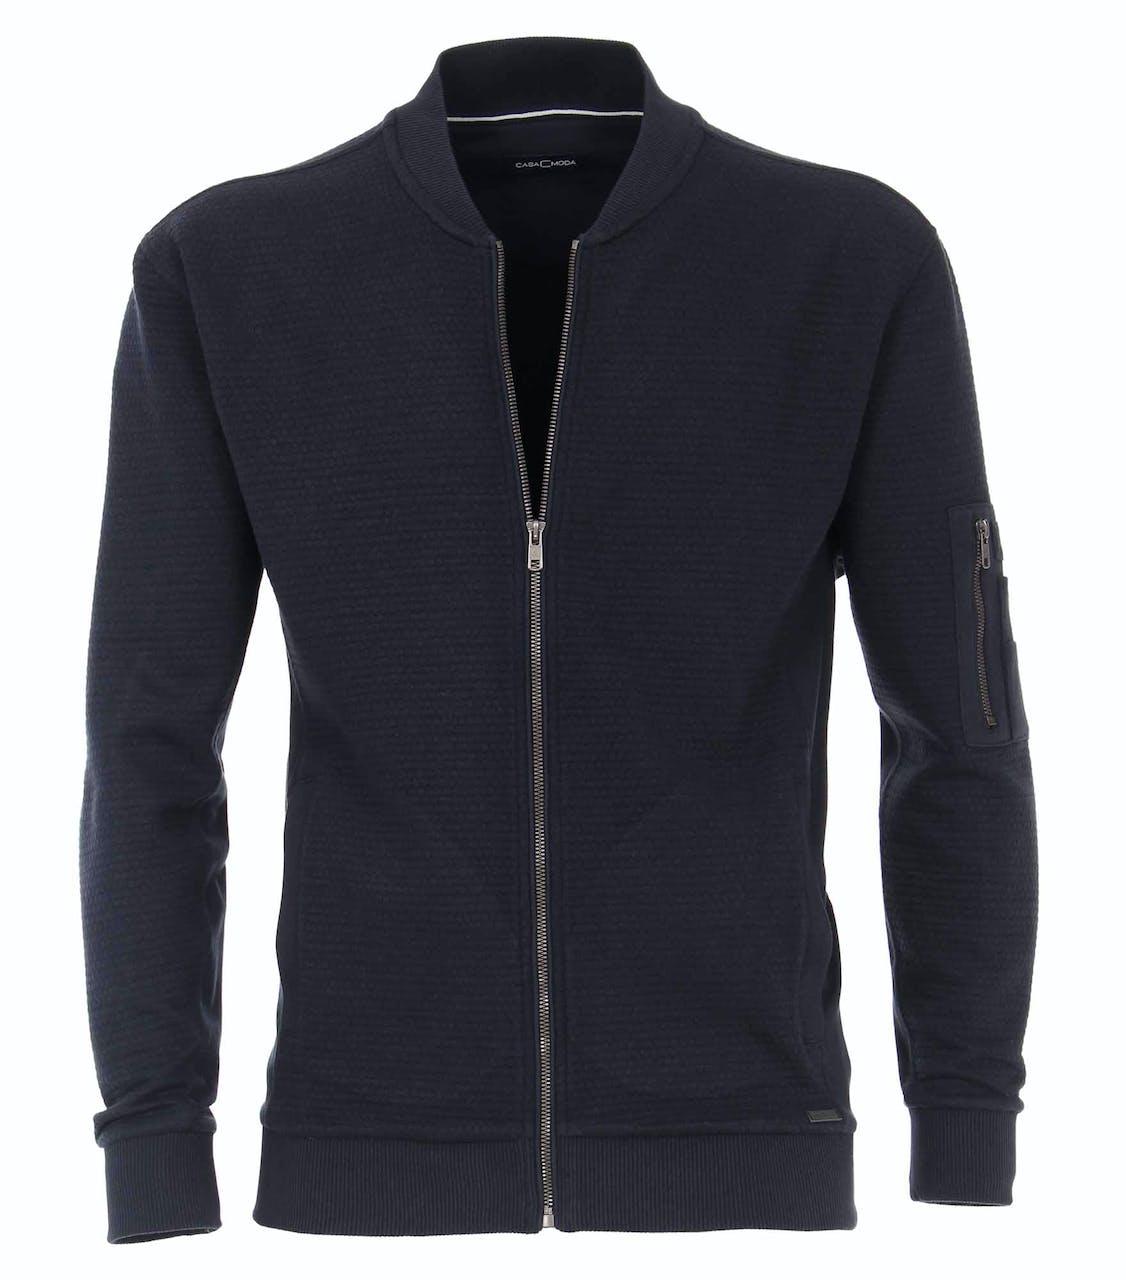 Sweatjacke - Regular Fit - Zipper